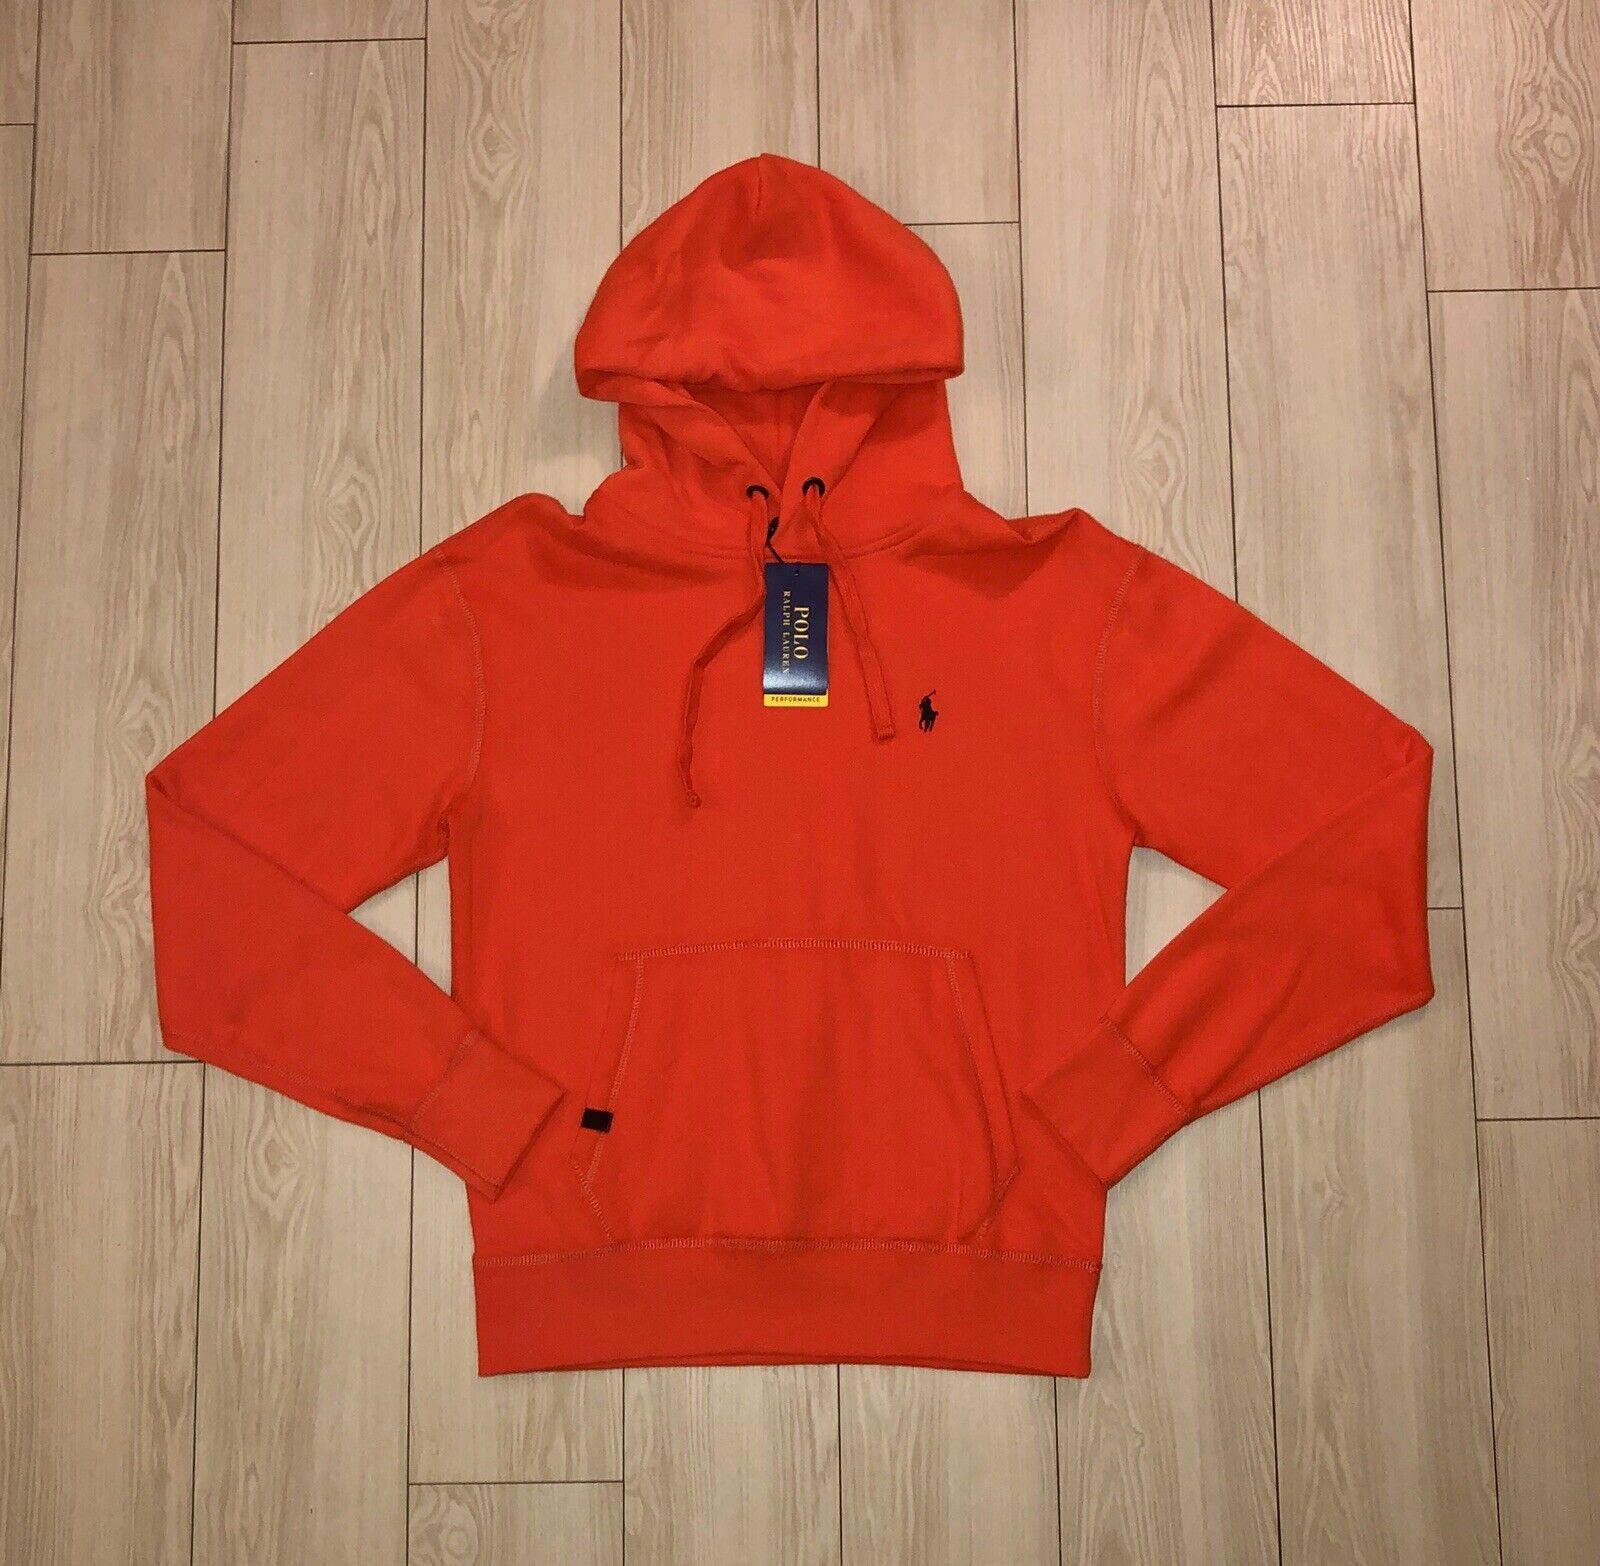 NEW NWT Mens POLO RALPH LAUREN Performance Sweatshirt Sweater Hoodie Orange S Sm